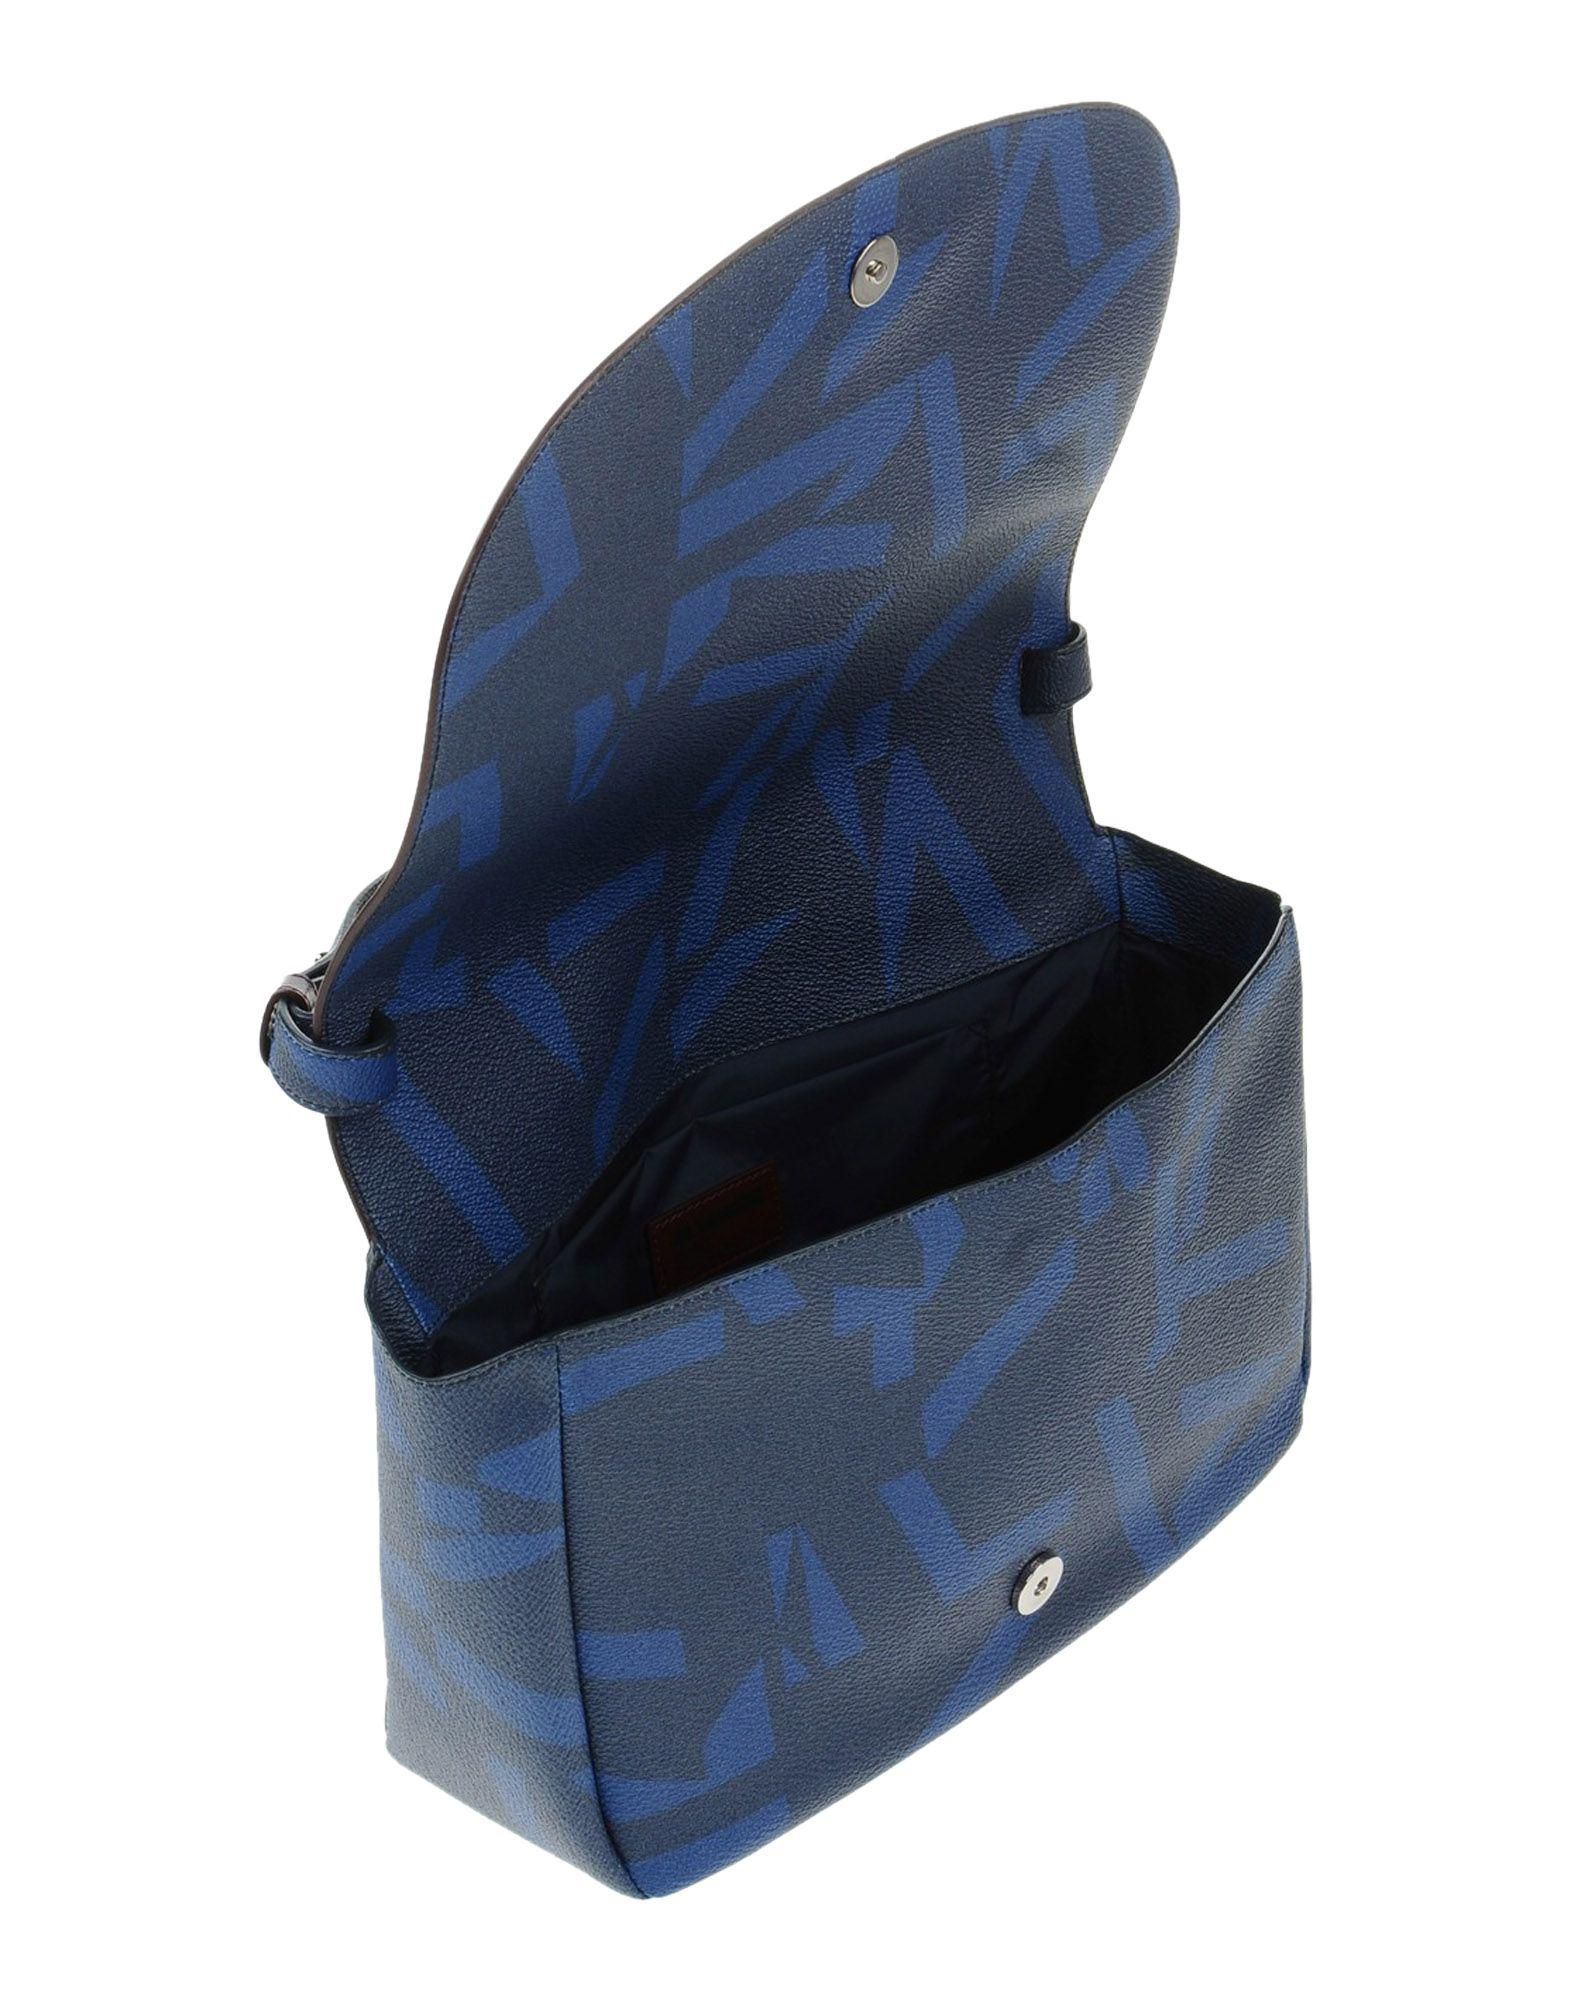 Jil Sander Navy Leather Cross-body Bags